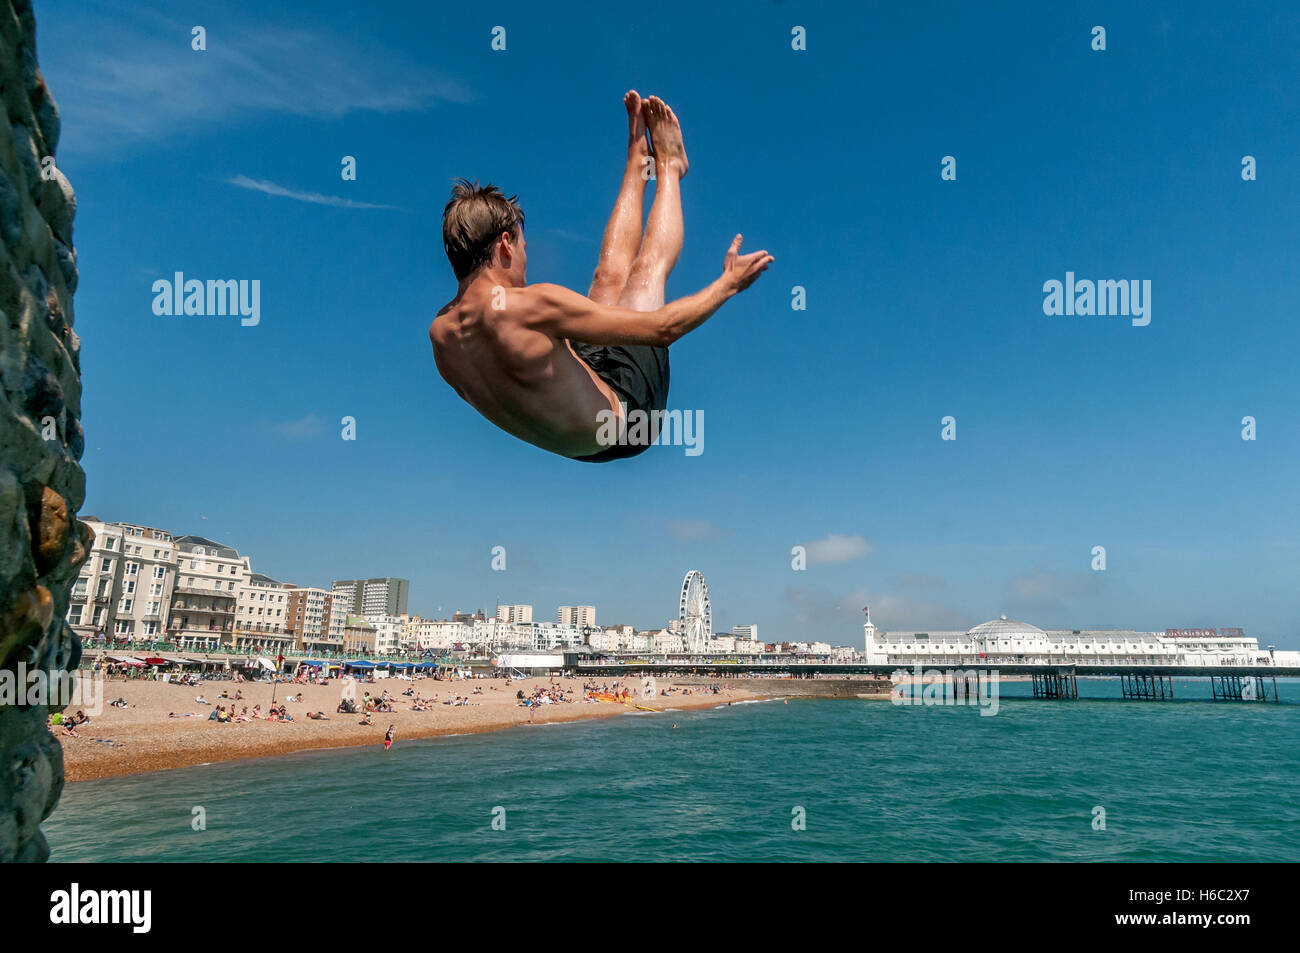 Boy diving into the sea on Brighton beach - Stock Image